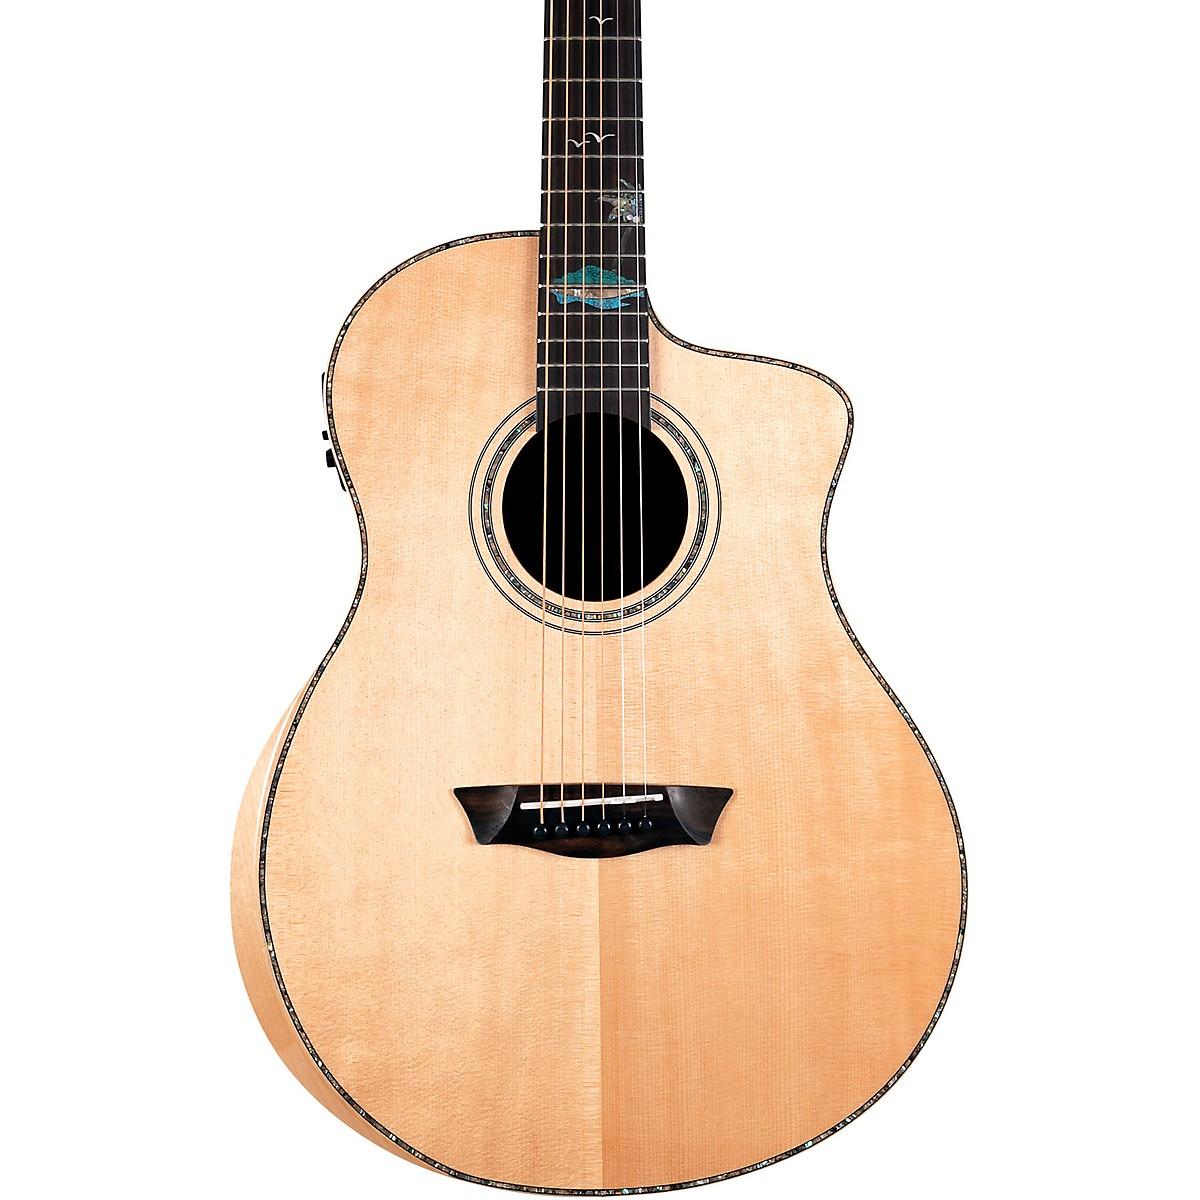 Washburn Bella Tono Allure SC56S Studio Acoustic-Electric Guitar